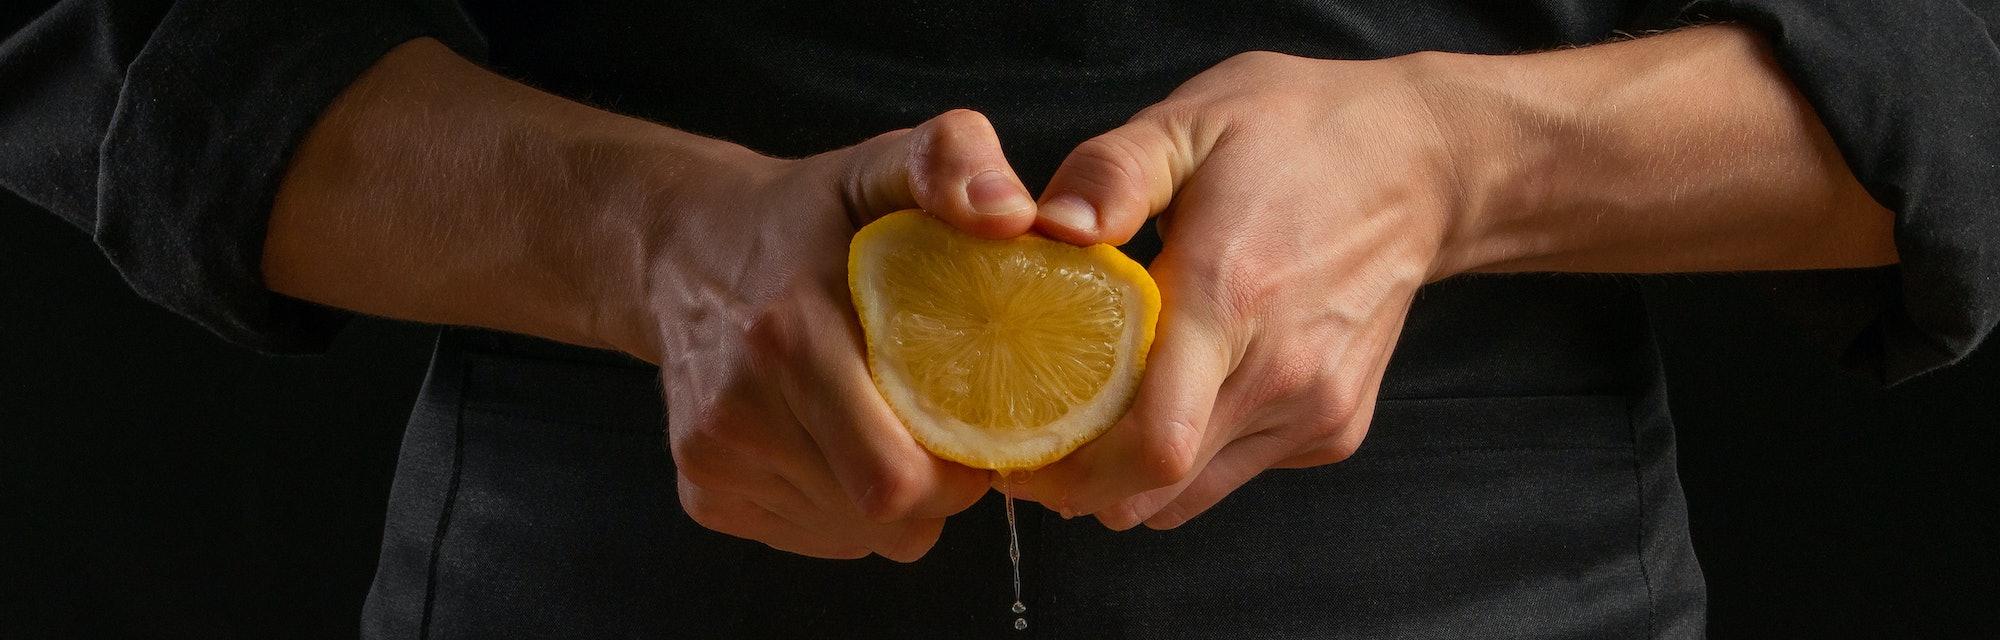 Chef squeezing lemon.